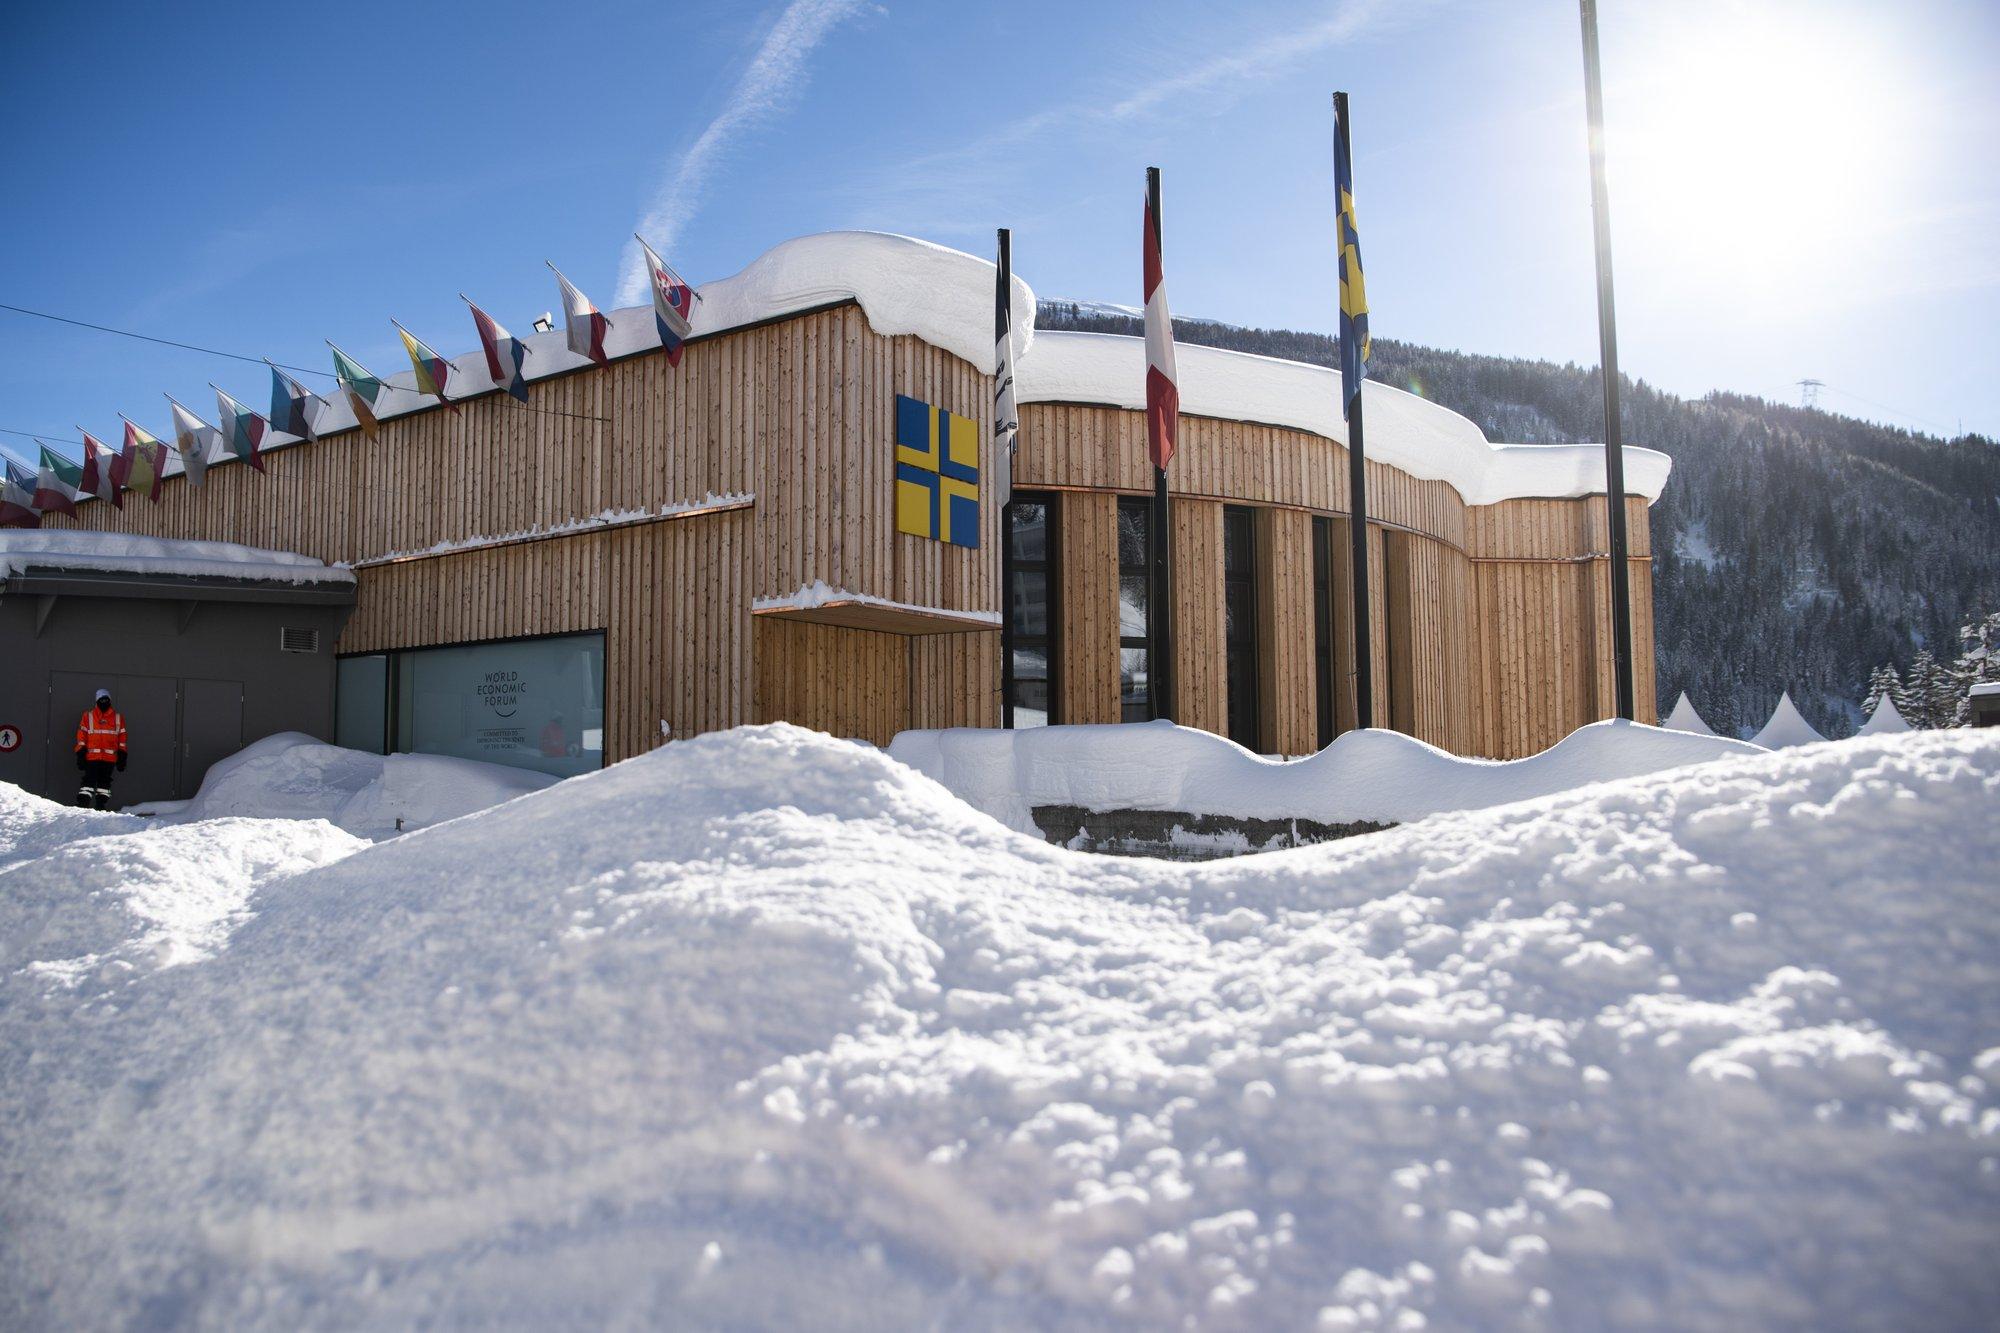 Facing populist assault, global elites regroup in Davos